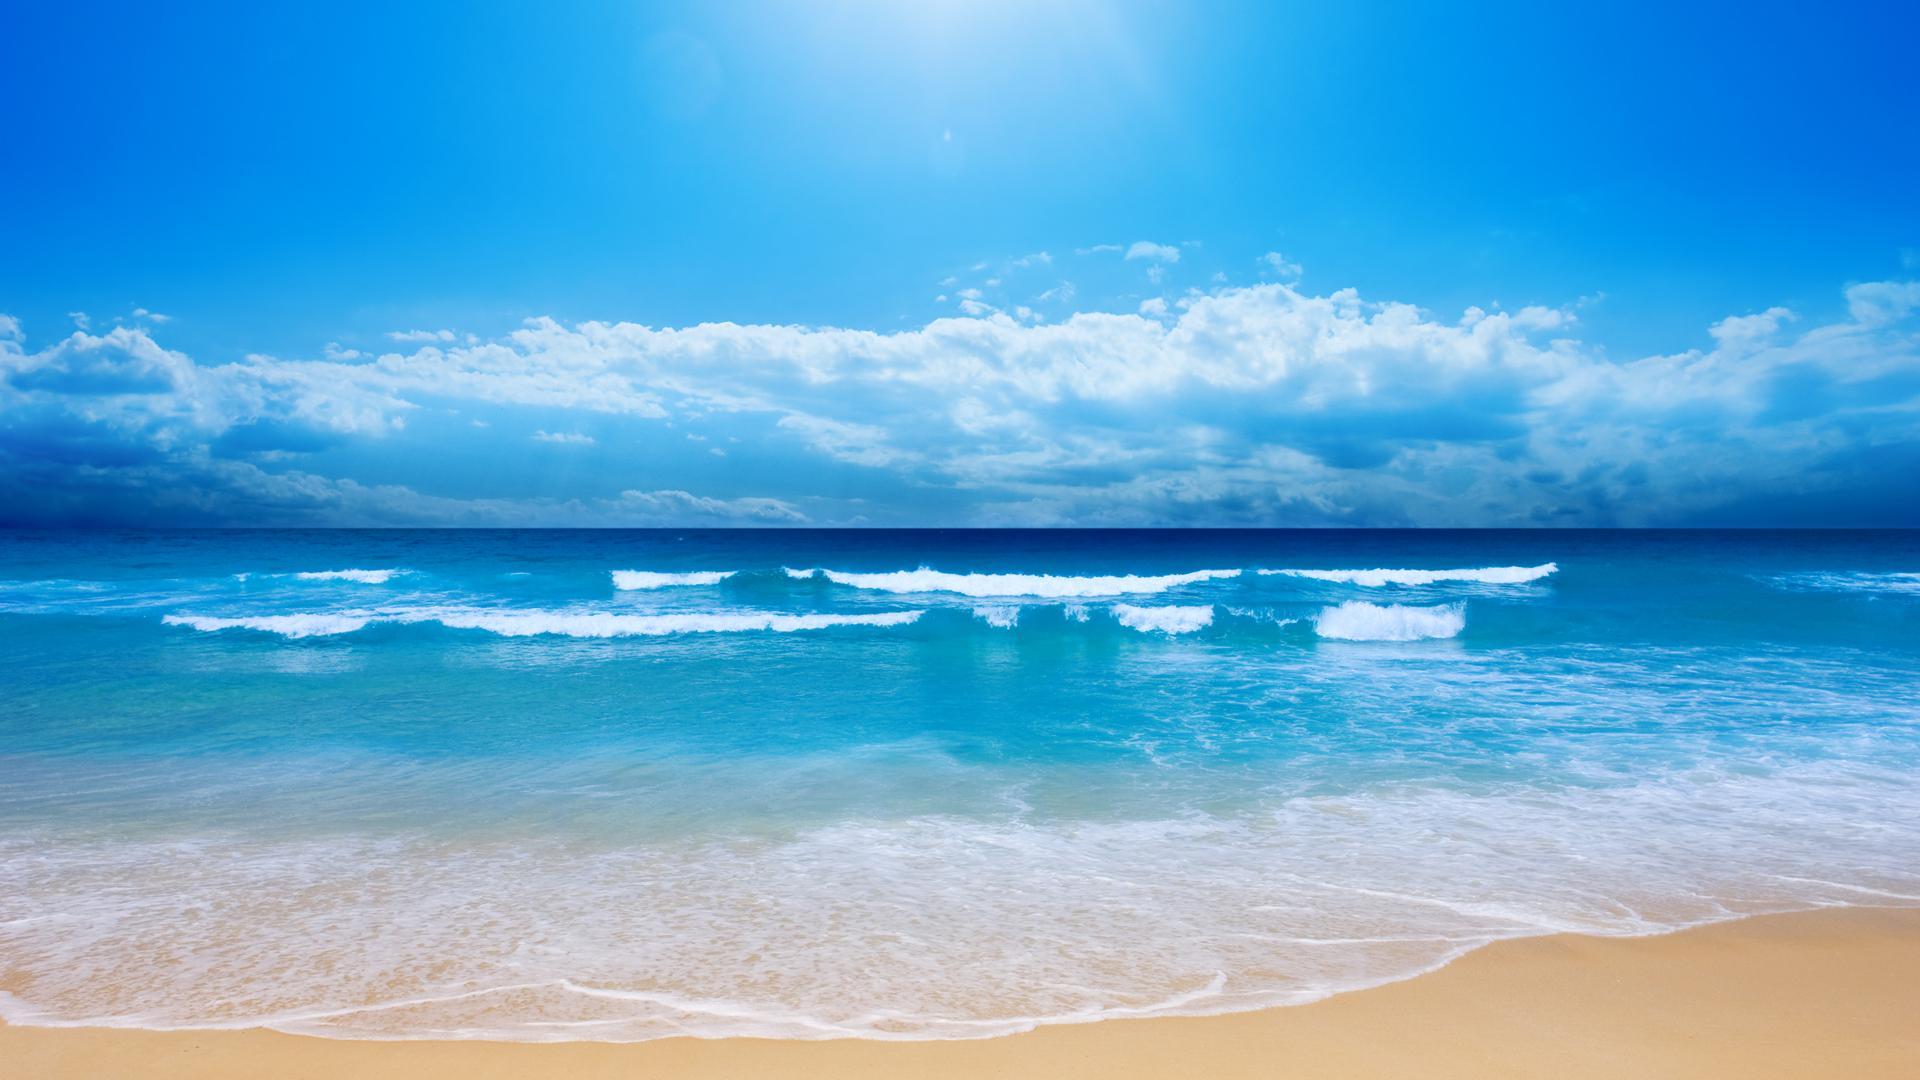 Ocean Desktop Backgrounds 1920x1080 wallpaper wallpaper hd 1920x1080